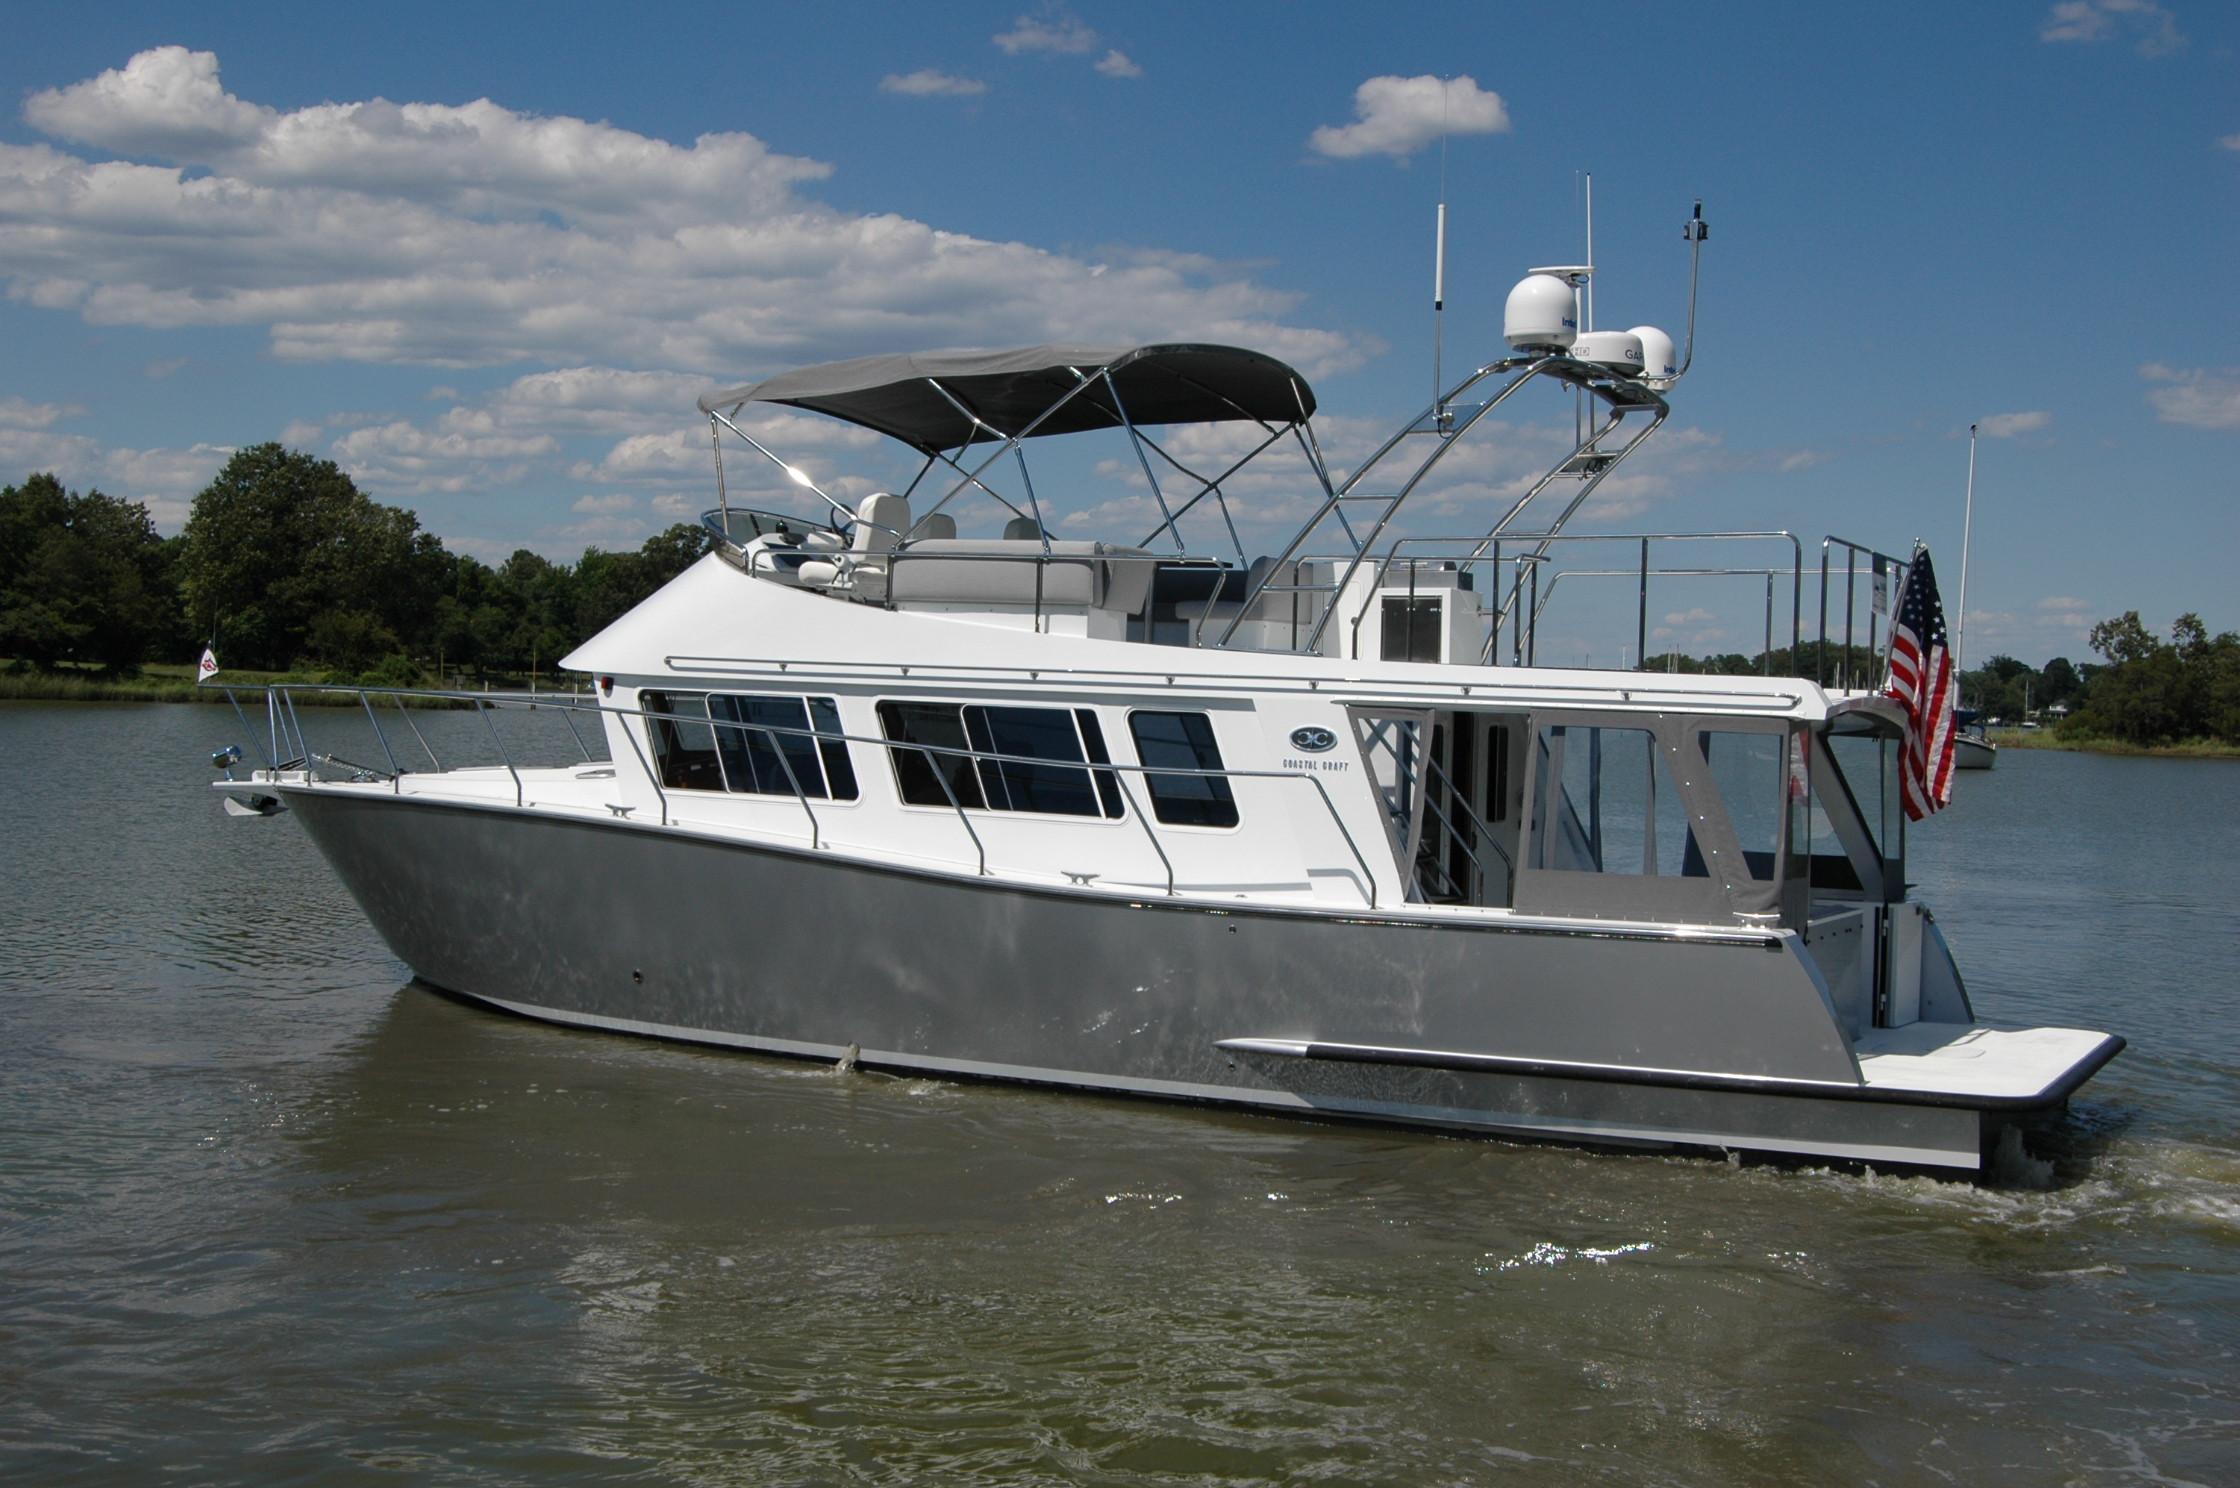 Marine Boat Swim Platform 316 Stainless Steel and Teak Wood 500mm Wide